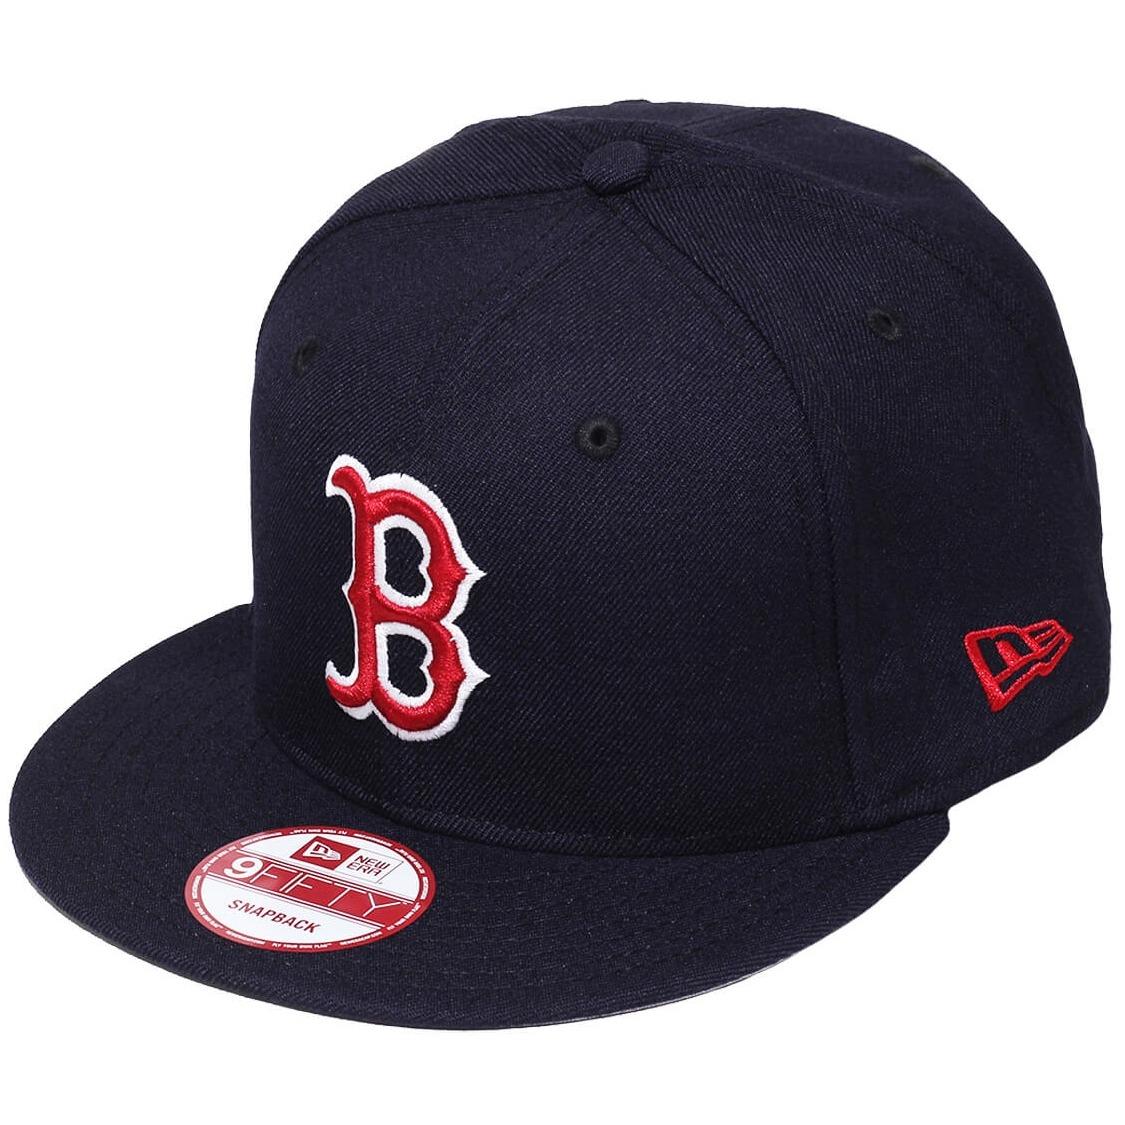 4ea23a78d boné new era aba reta snapback mlb boston colors azul escuro. Carregando  zoom.